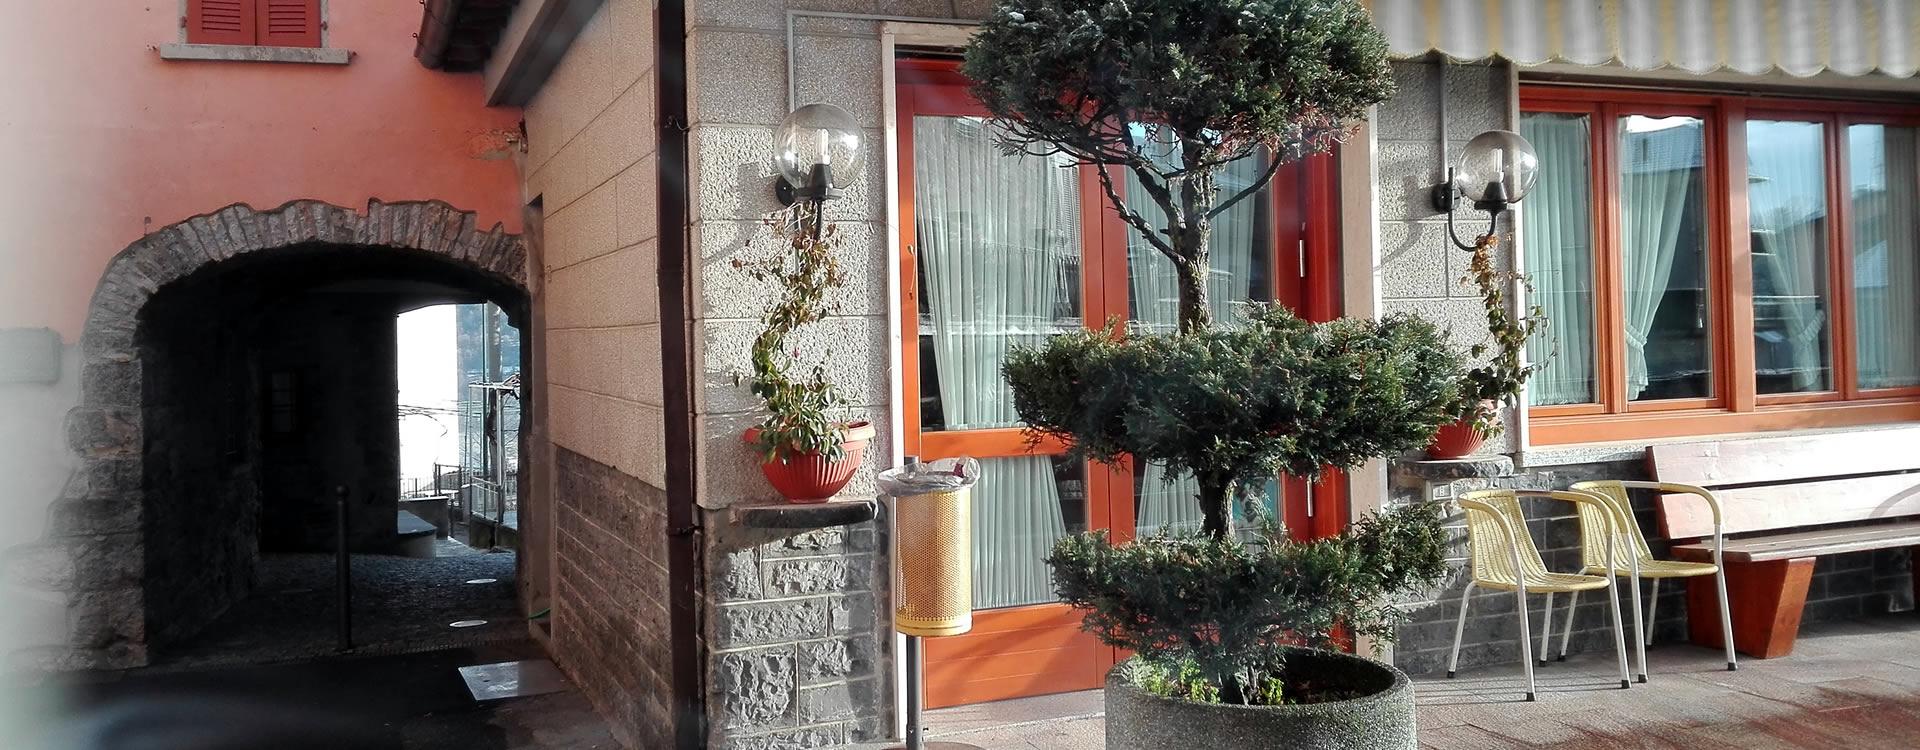 hotel_valle_imagna_02